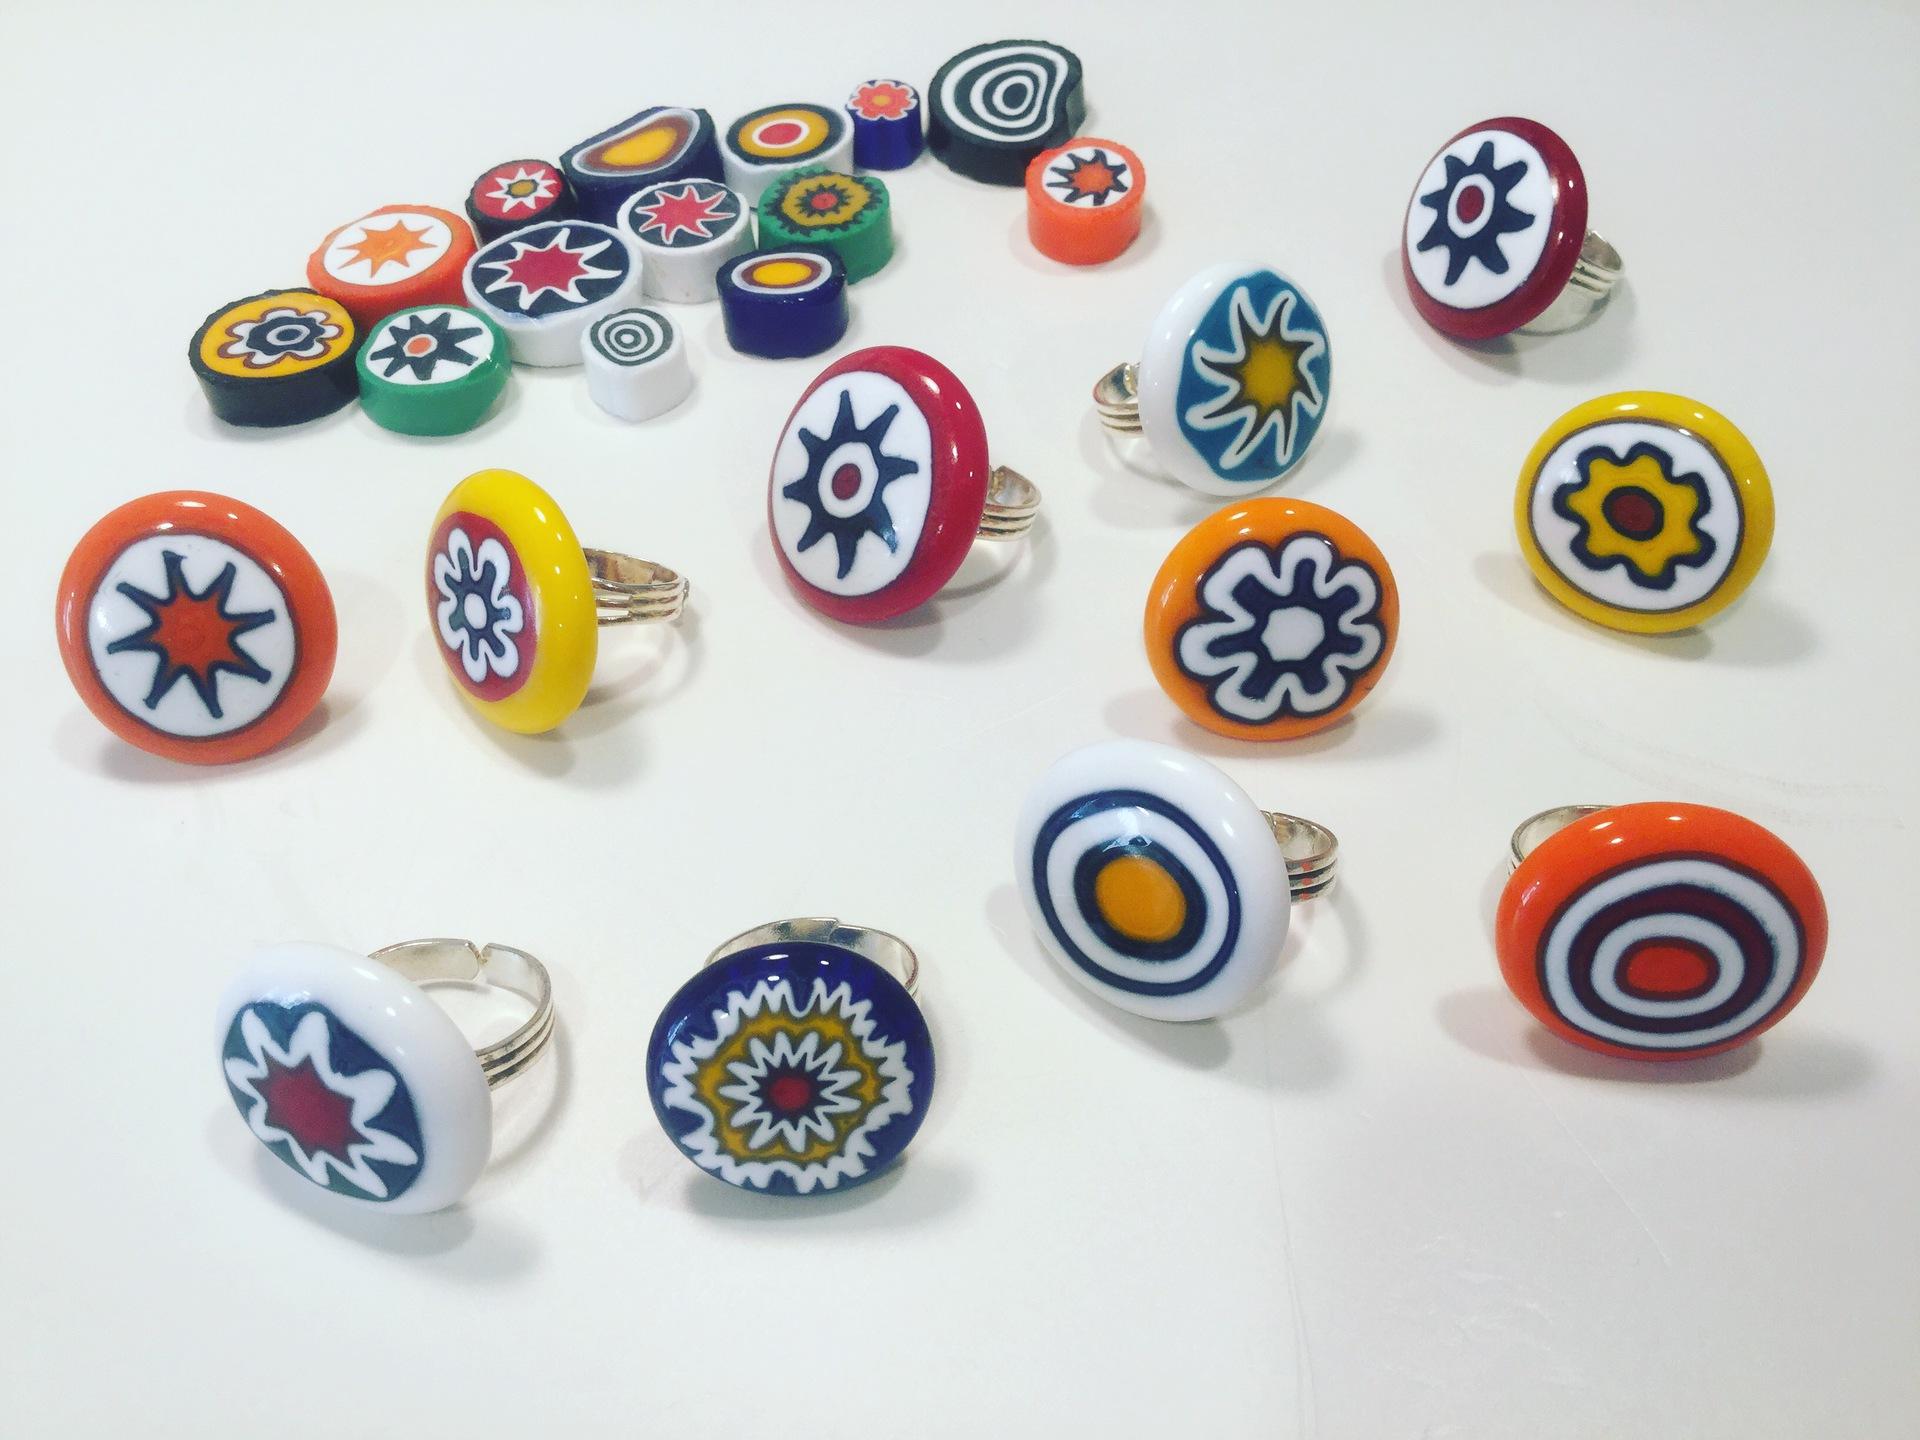 momentum-glass-artigiani-del-vetro-frascati-roma-thumbnail